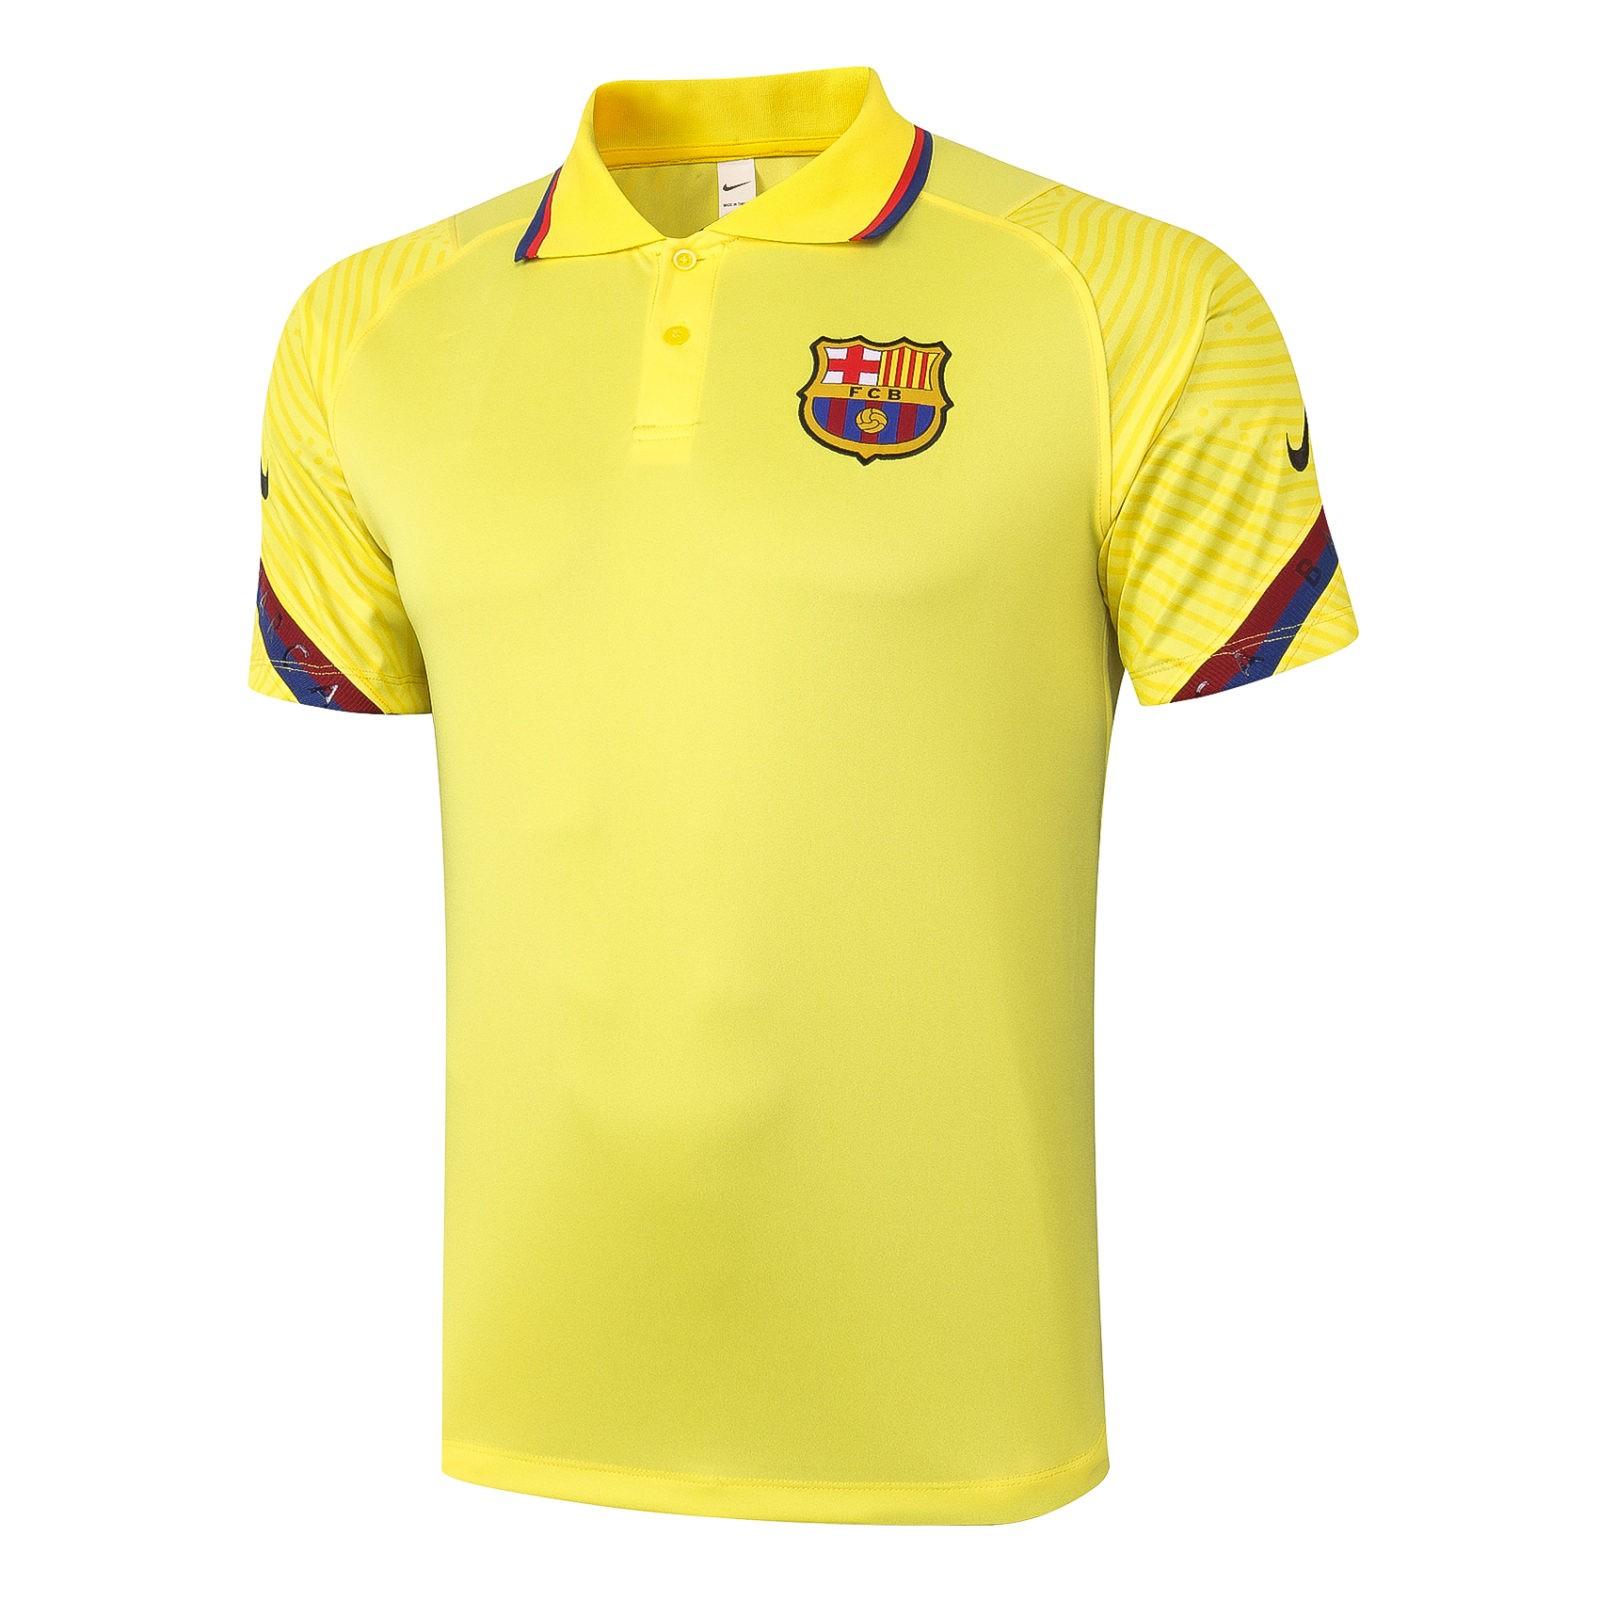 Футболка поло Барселоны 2020 — 2021 (Жёлтая)